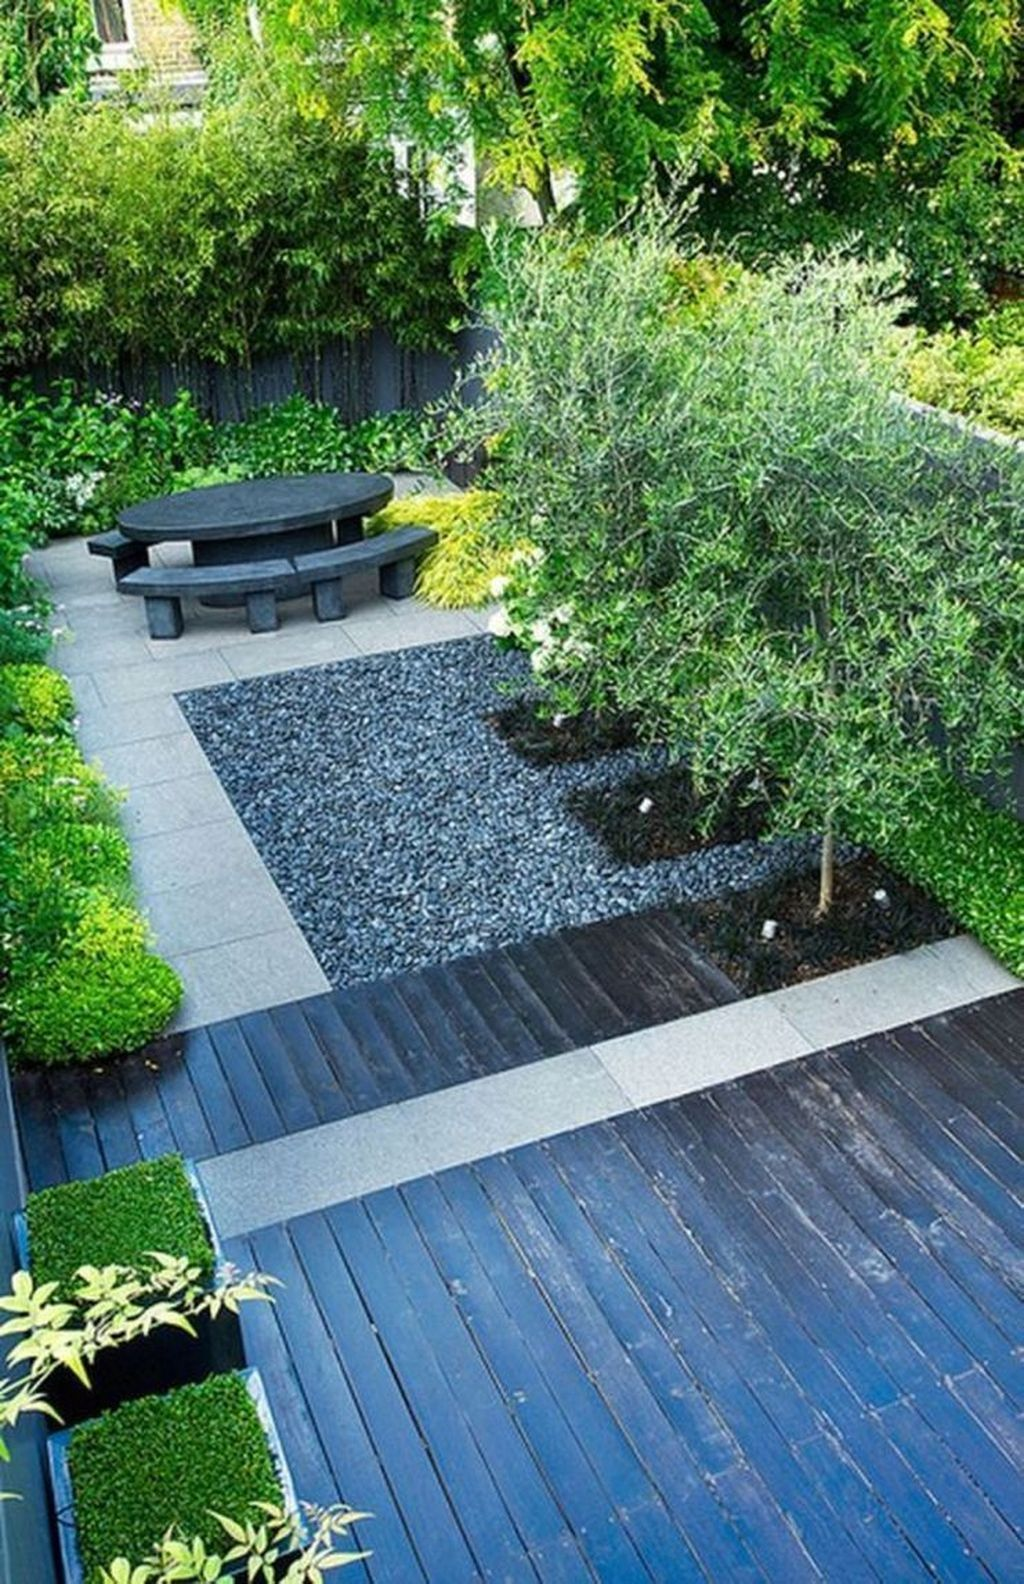 32 The Best Minimalist Garden Design Ideas You Have To Try Pimphomee In 2020 Japanese Garden Design Minimalist Garden Small Japanese Garden